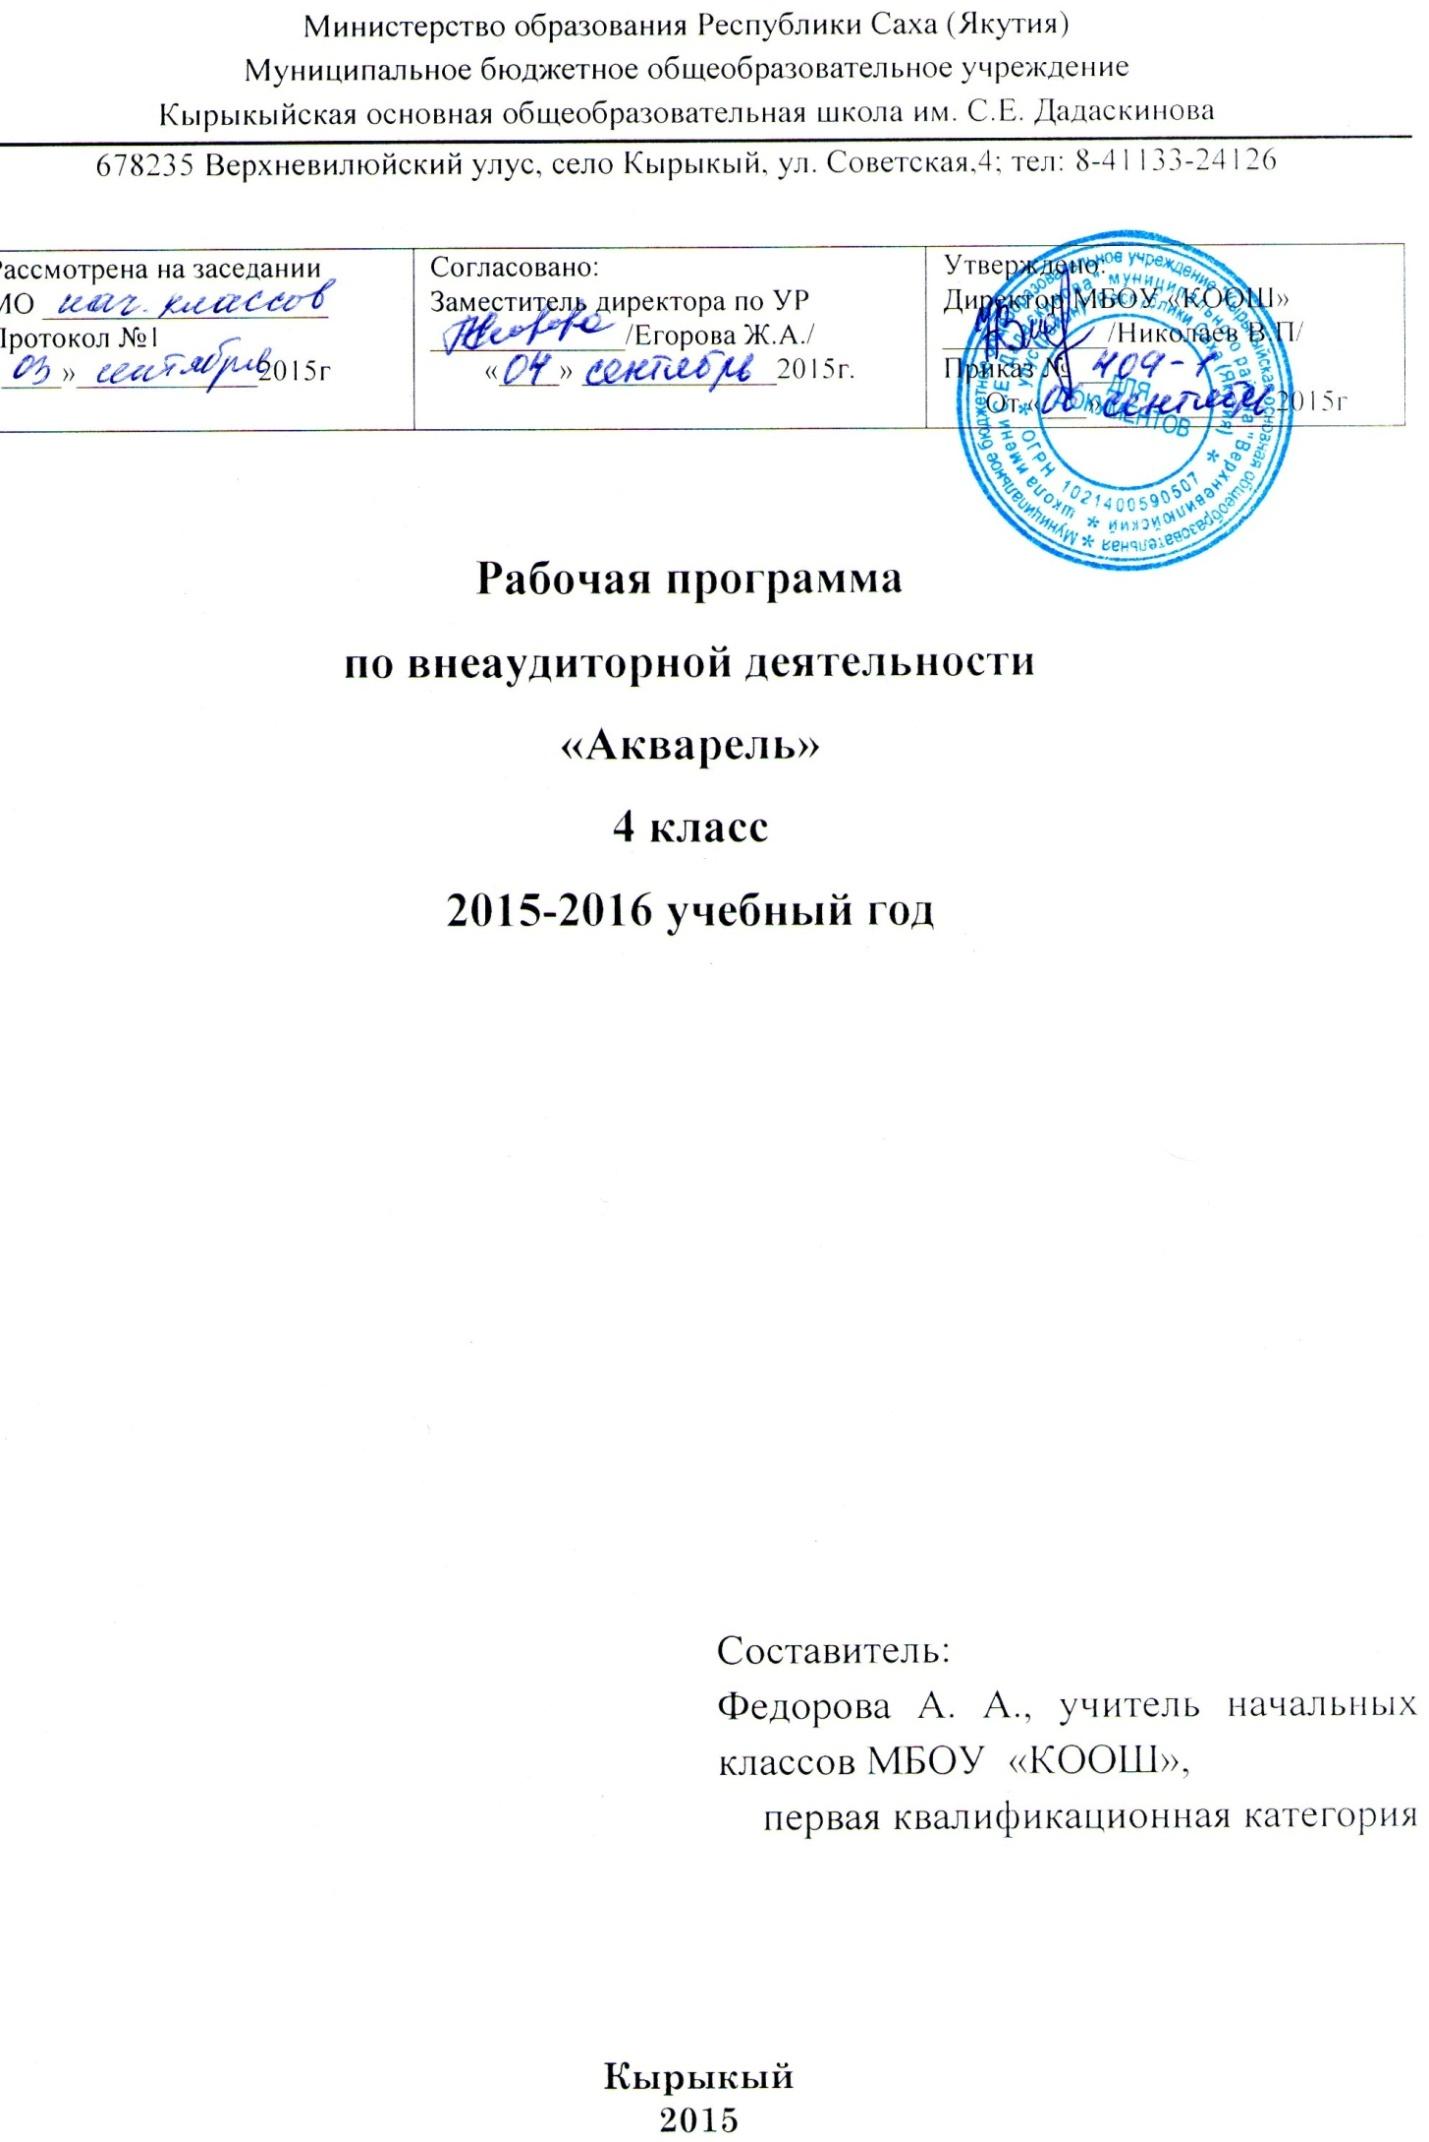 C:\Documents and Settings\Admin\Рабочий стол\Федорова А.Адля проверки\docx601.jpg